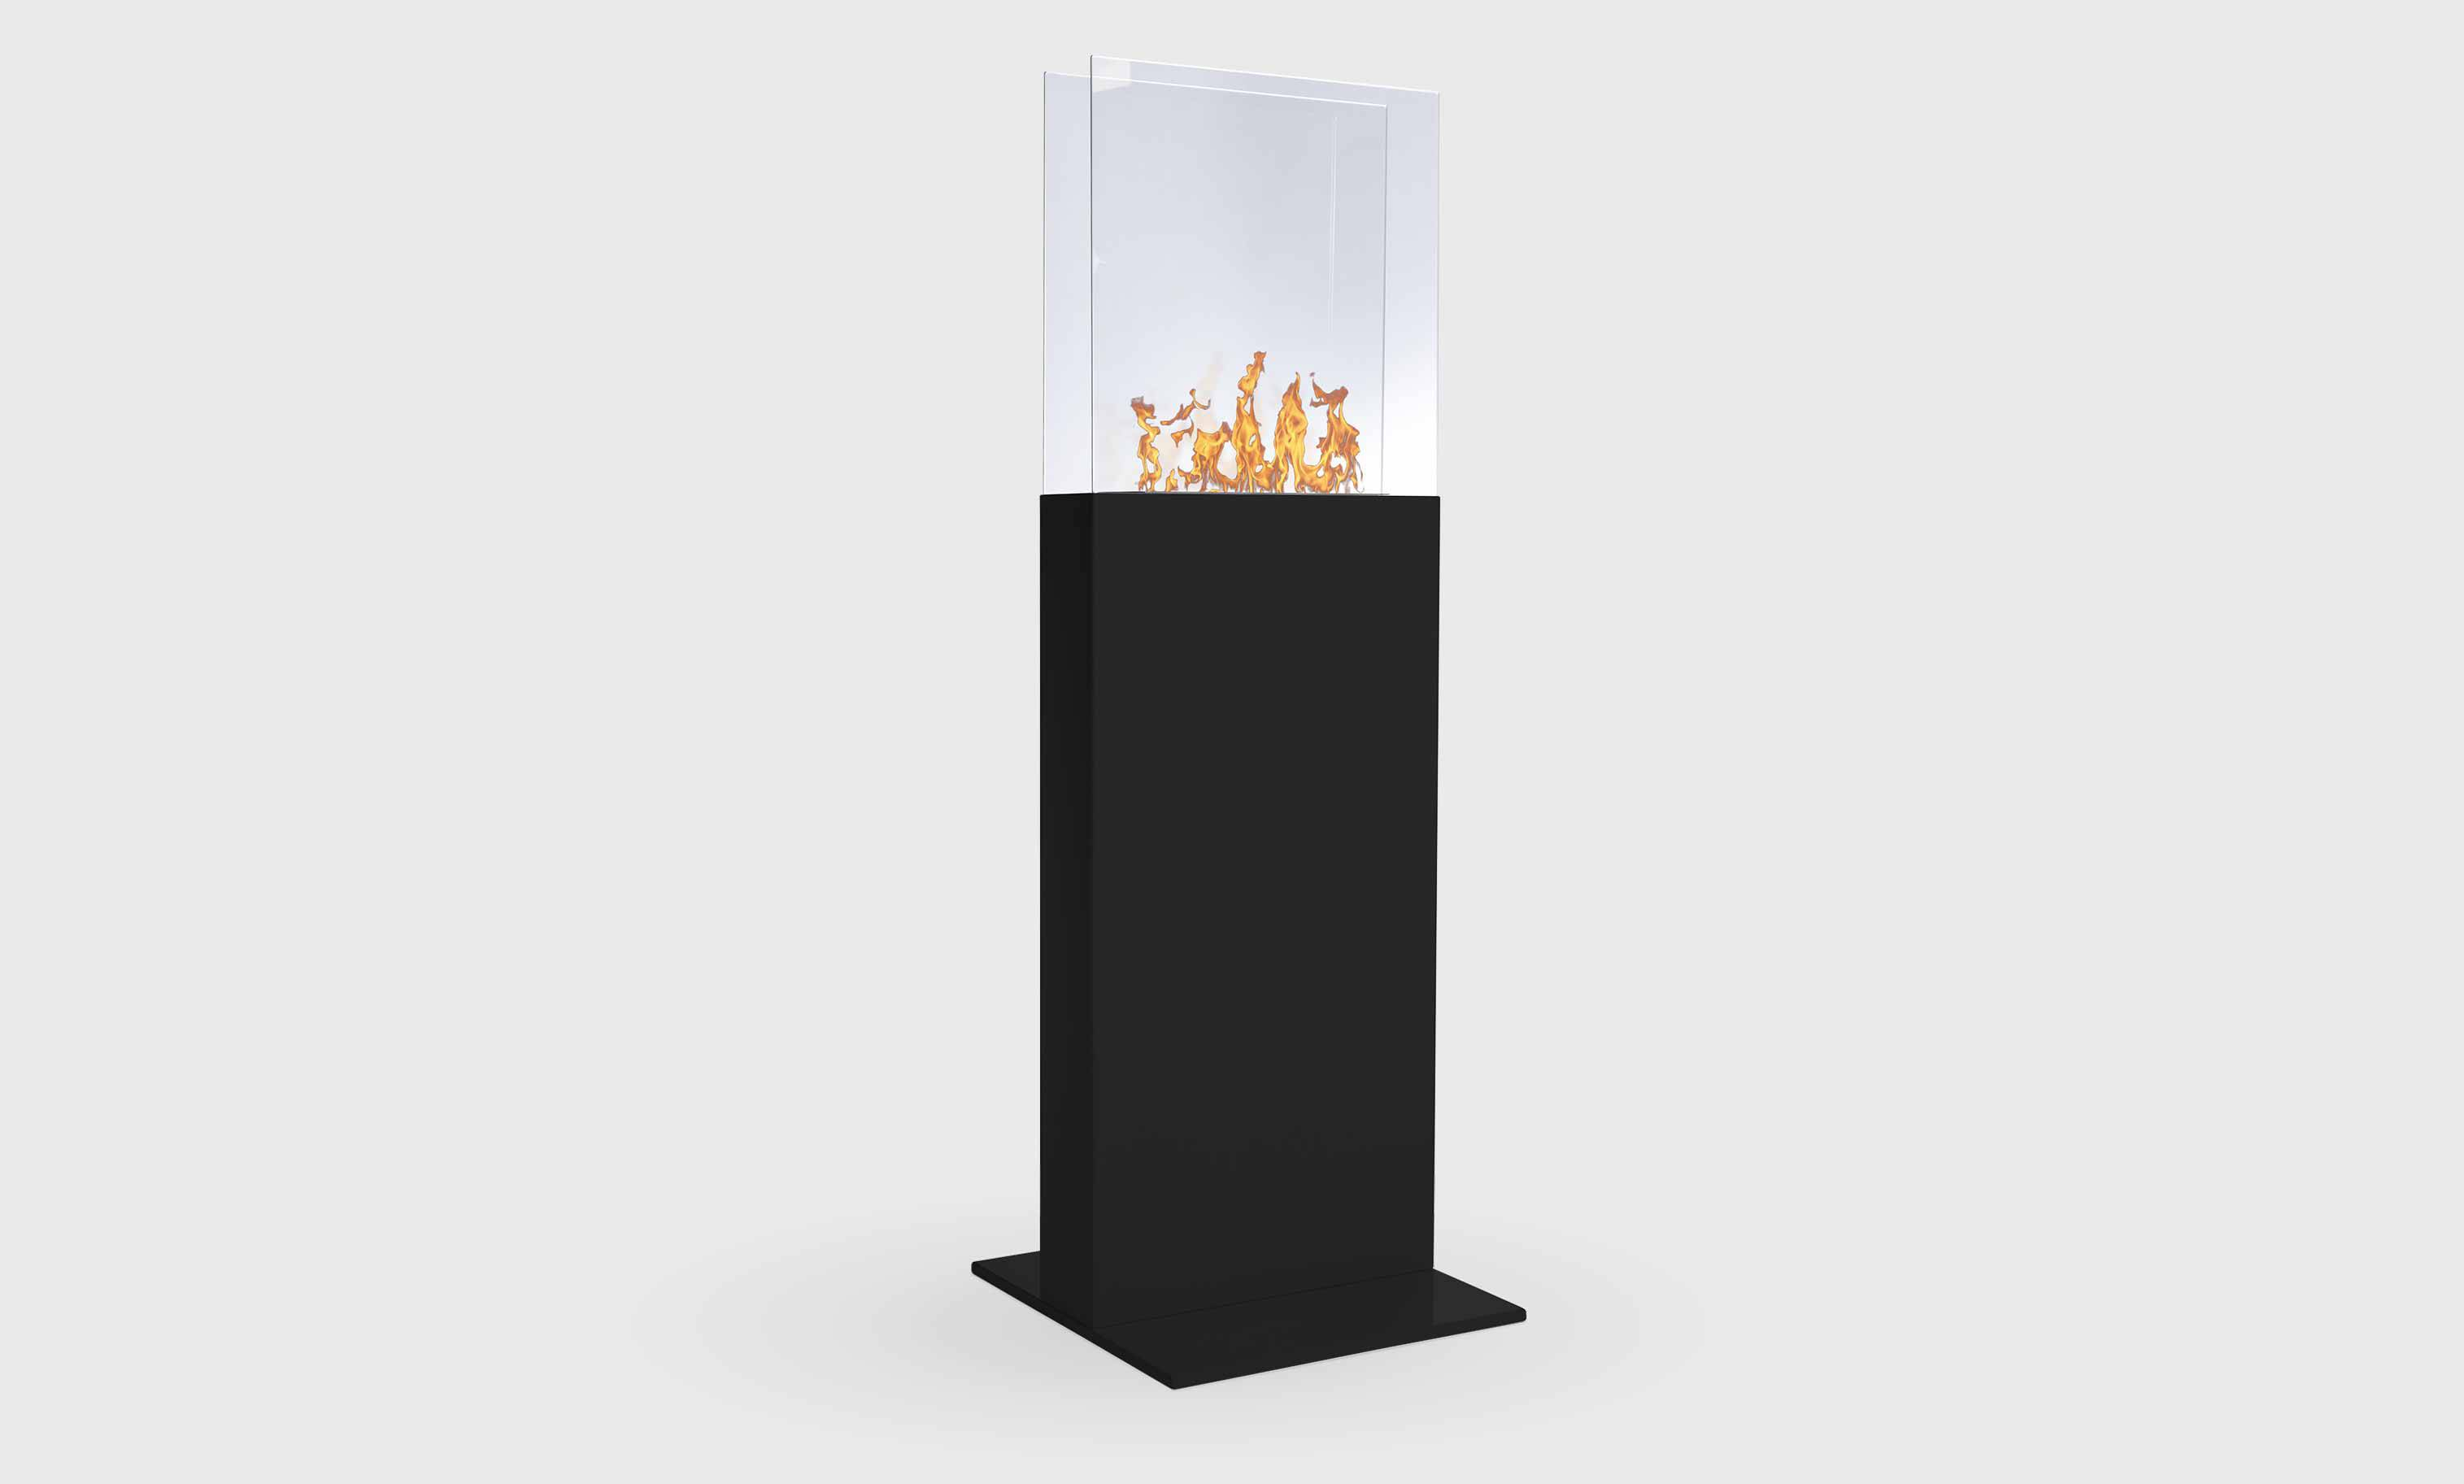 cheminee ethanol sur pied. Black Bedroom Furniture Sets. Home Design Ideas